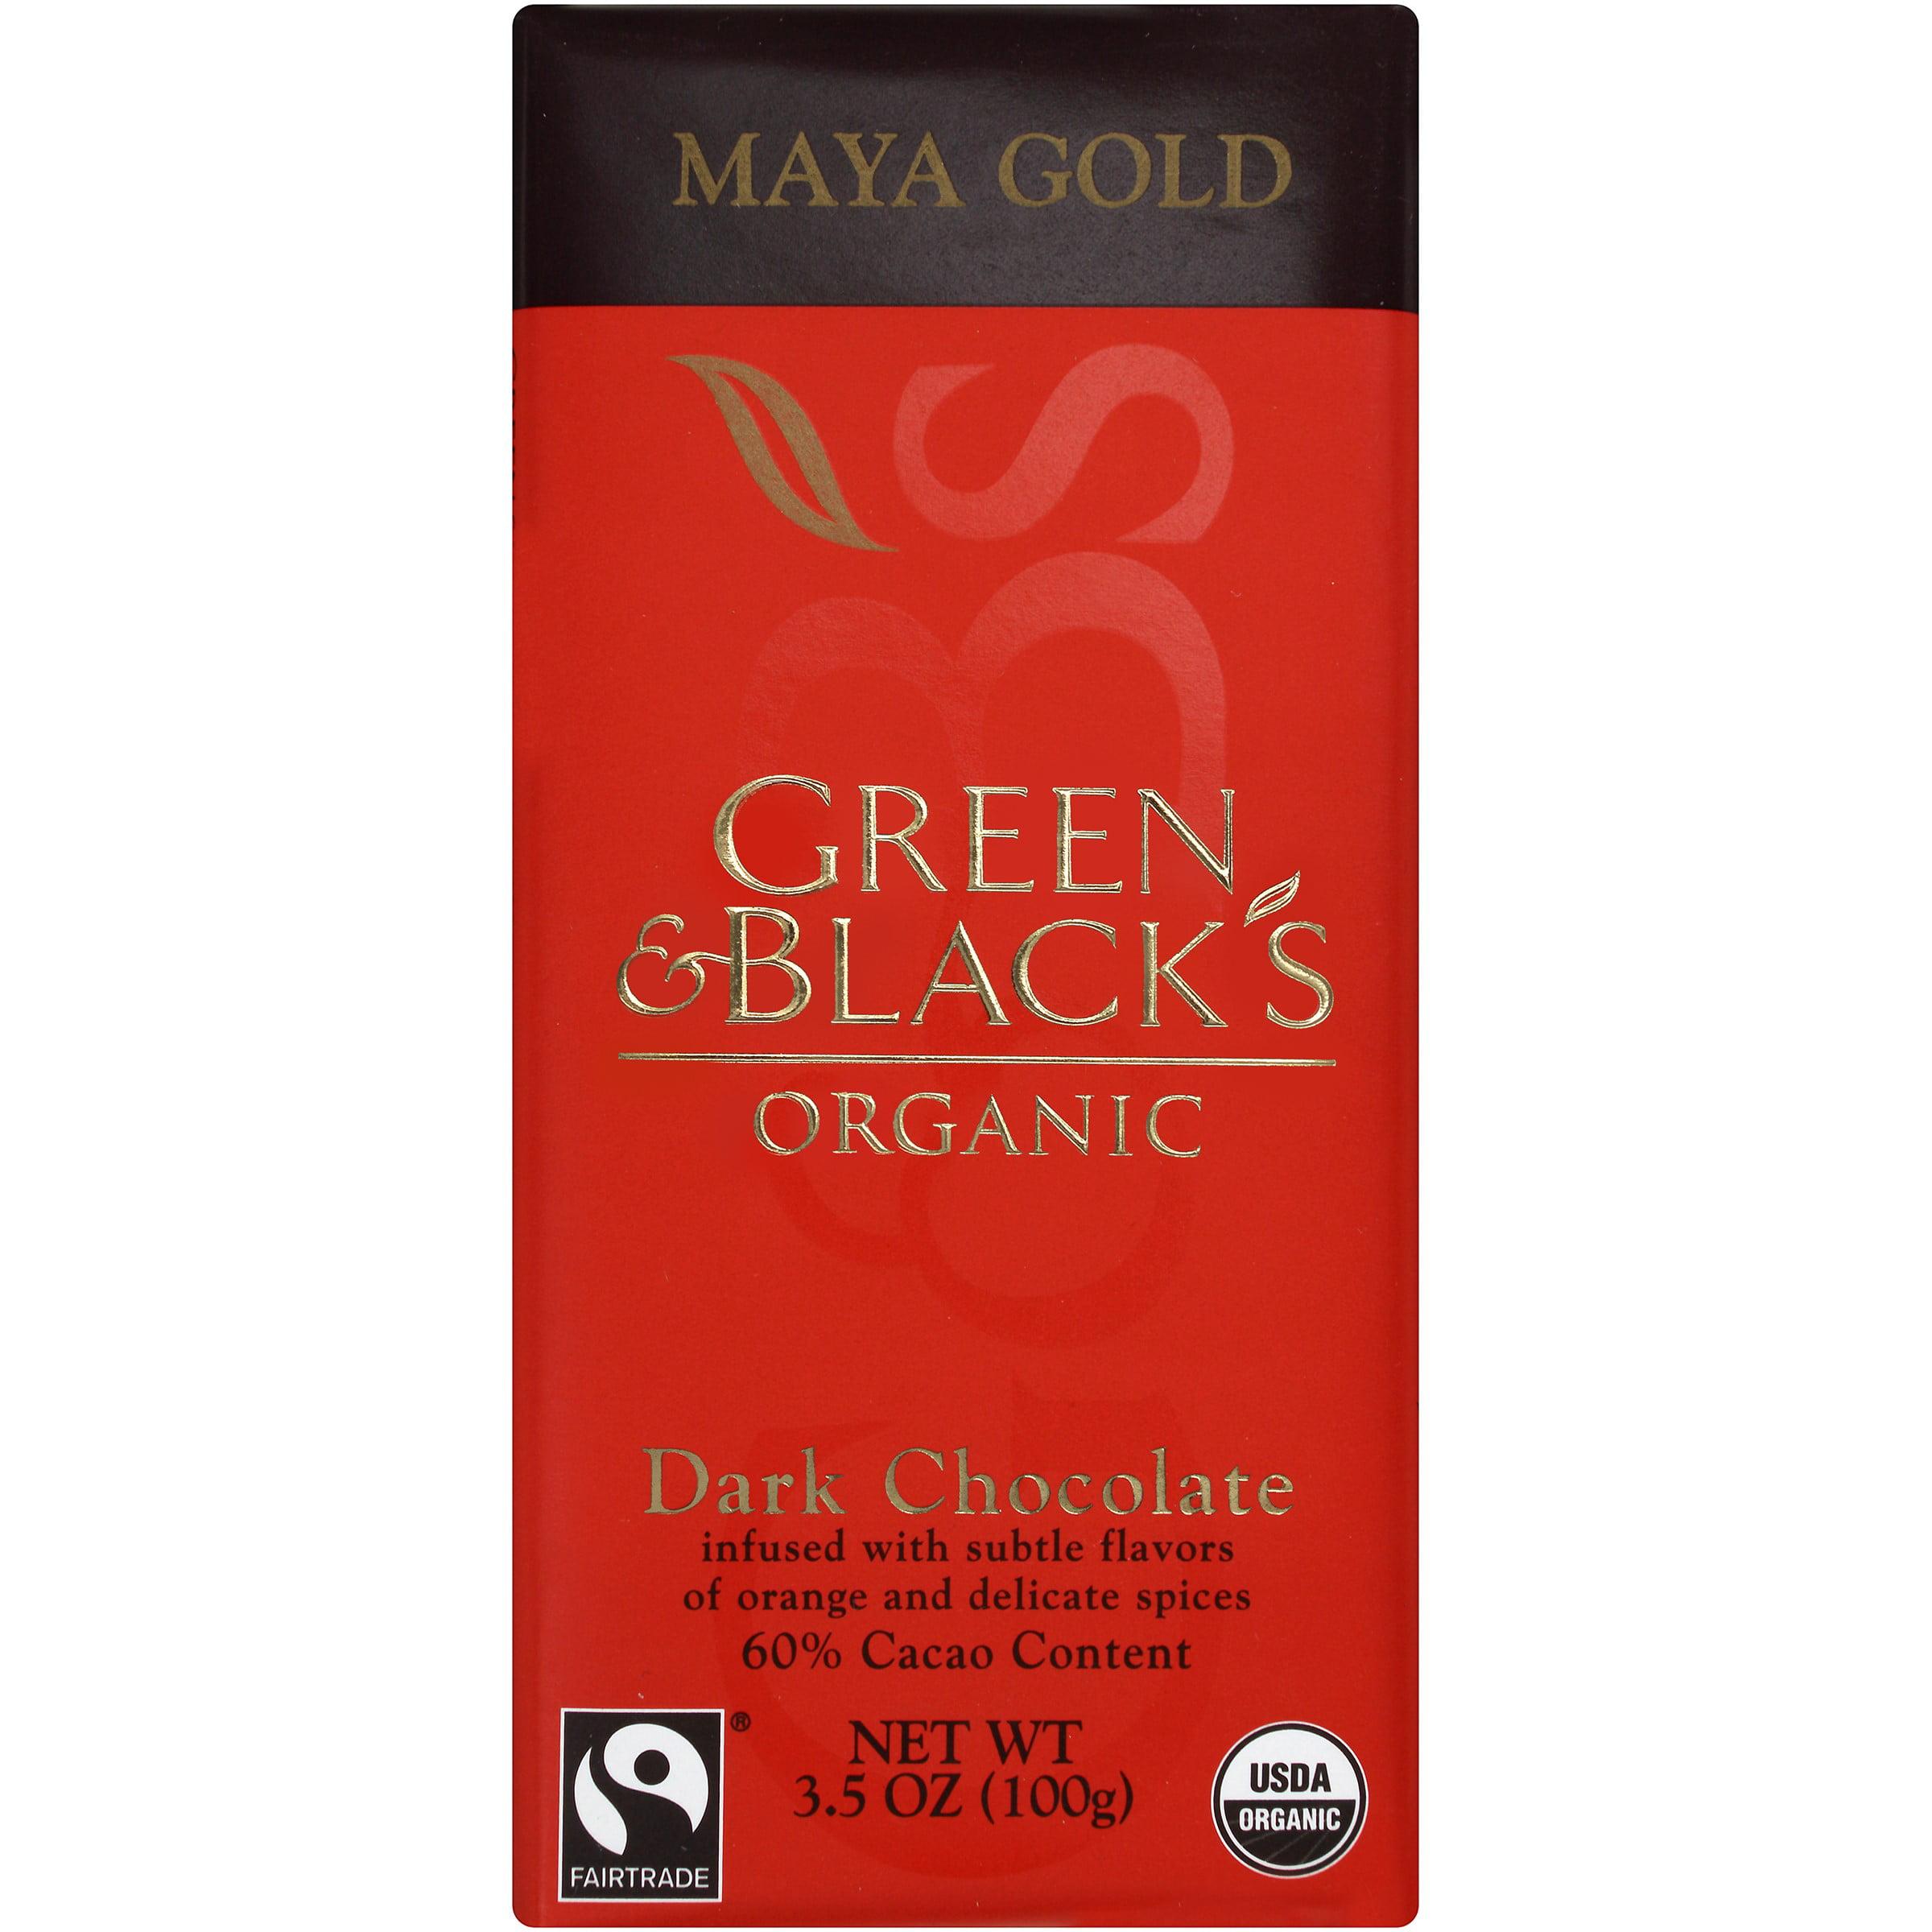 Green and Blacks Organic Maya Gold Dark Chocolate 3.5 Oz Bar by Mondelez